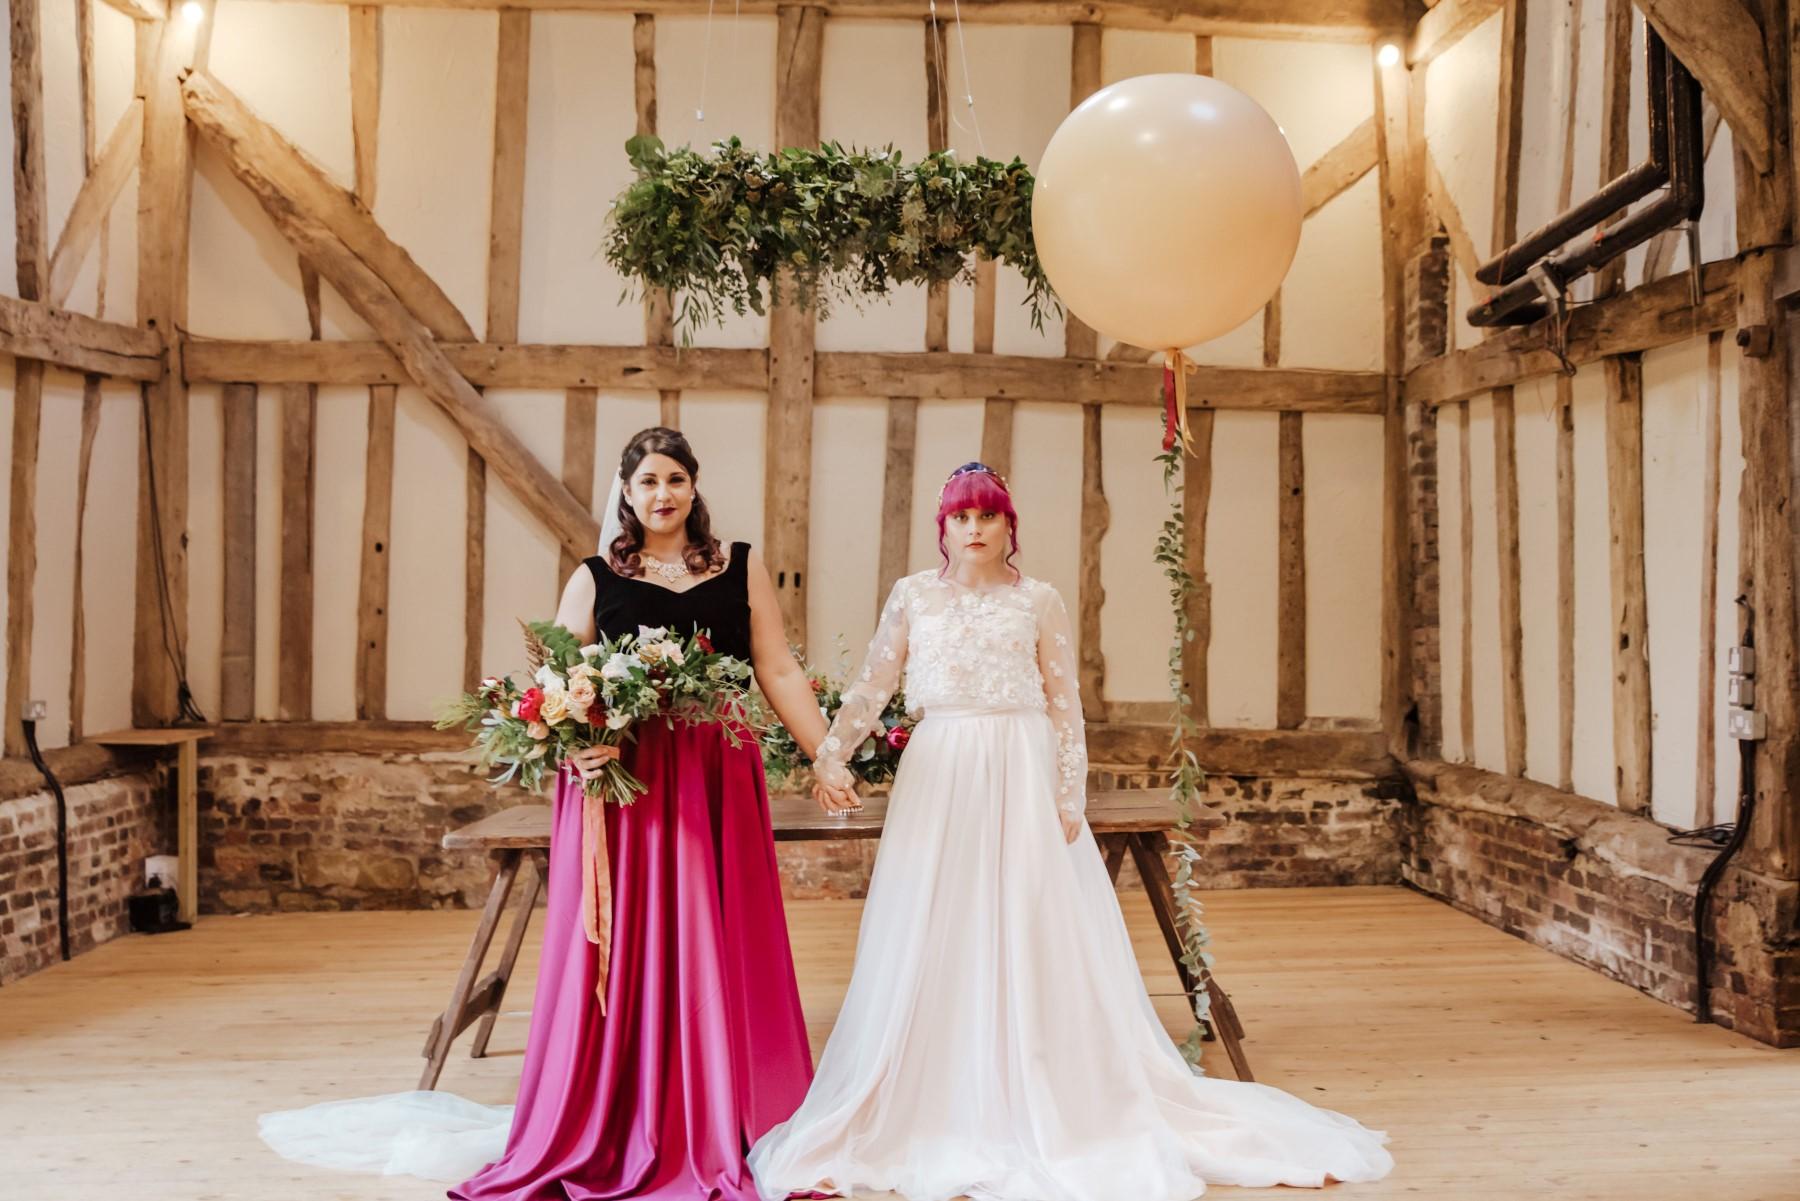 Roshni Photography- Barn Wedding Shoot- Balloon